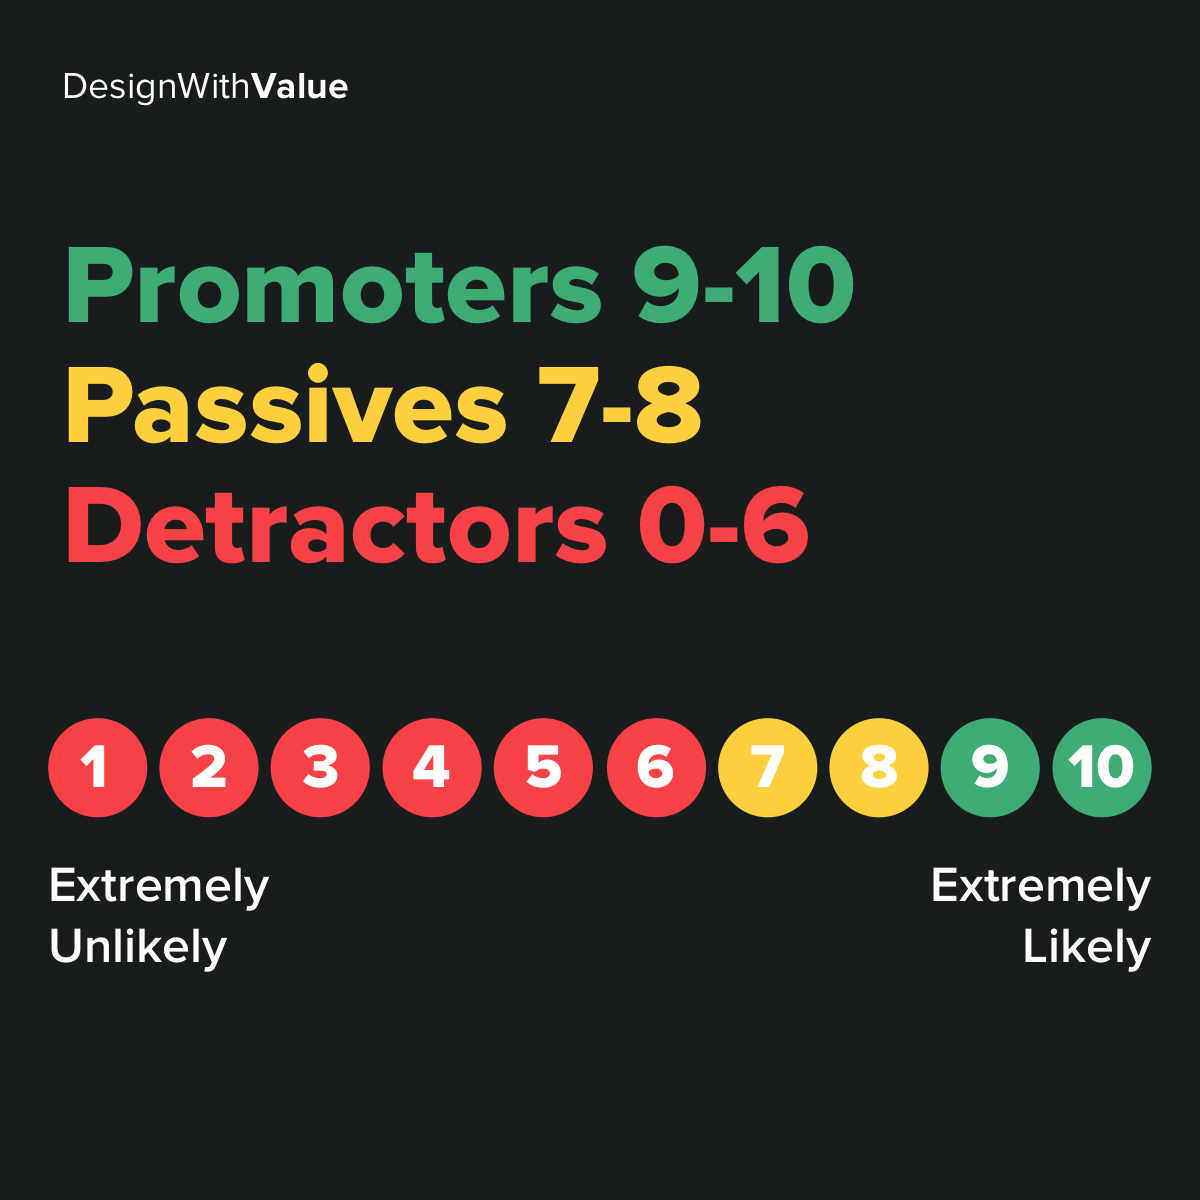 Promoters = 9-10. Passives = 7-8. Detractors = 0-6.